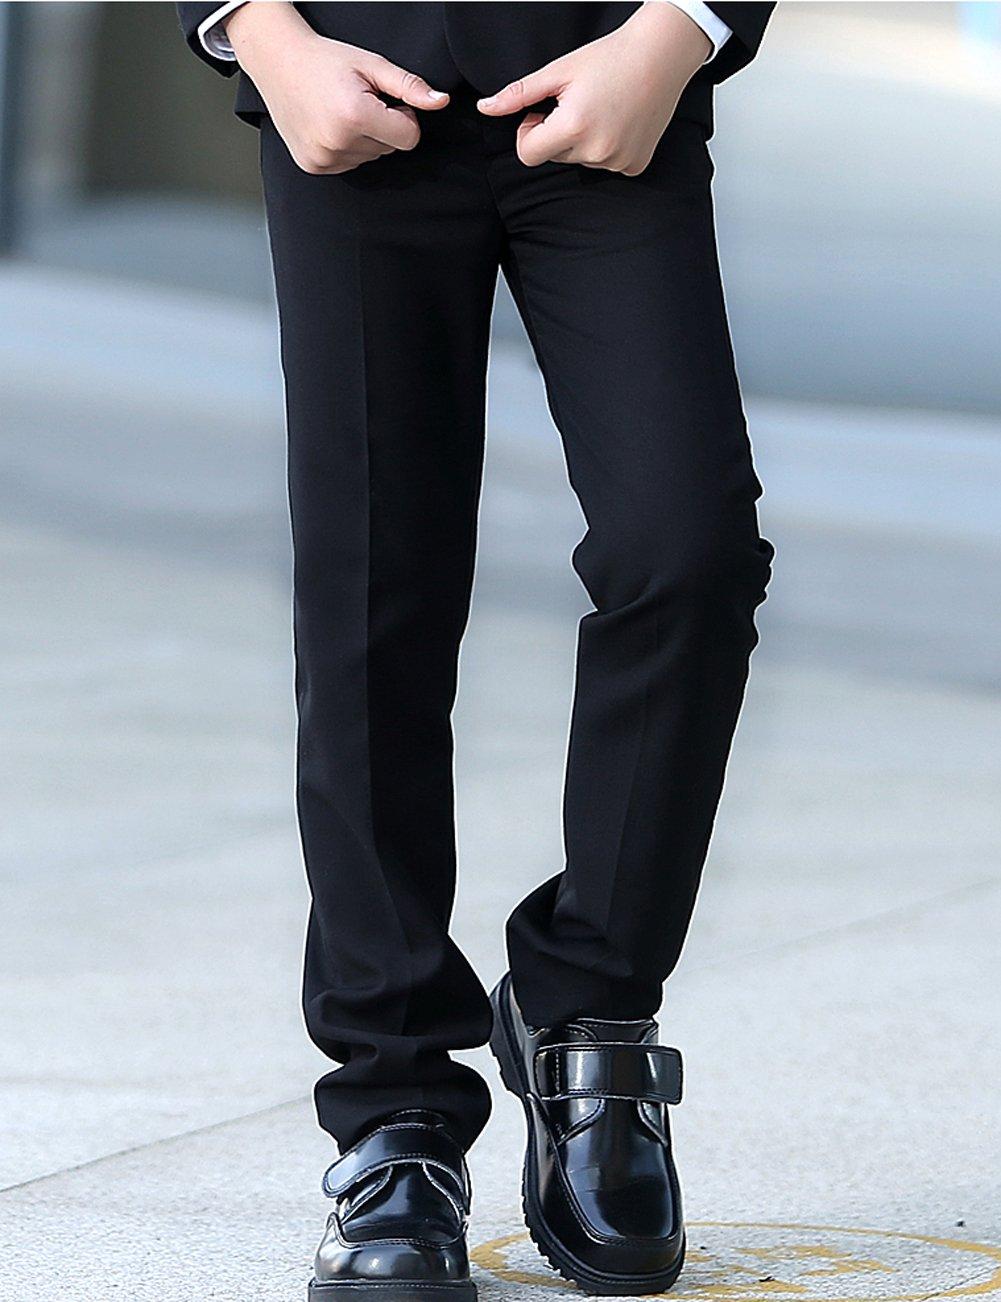 YuanLu Boys Colorful Formal Suits 5 Piece Slim Fit Dresswear Suit Set (Black, 14) by YuanLu (Image #7)